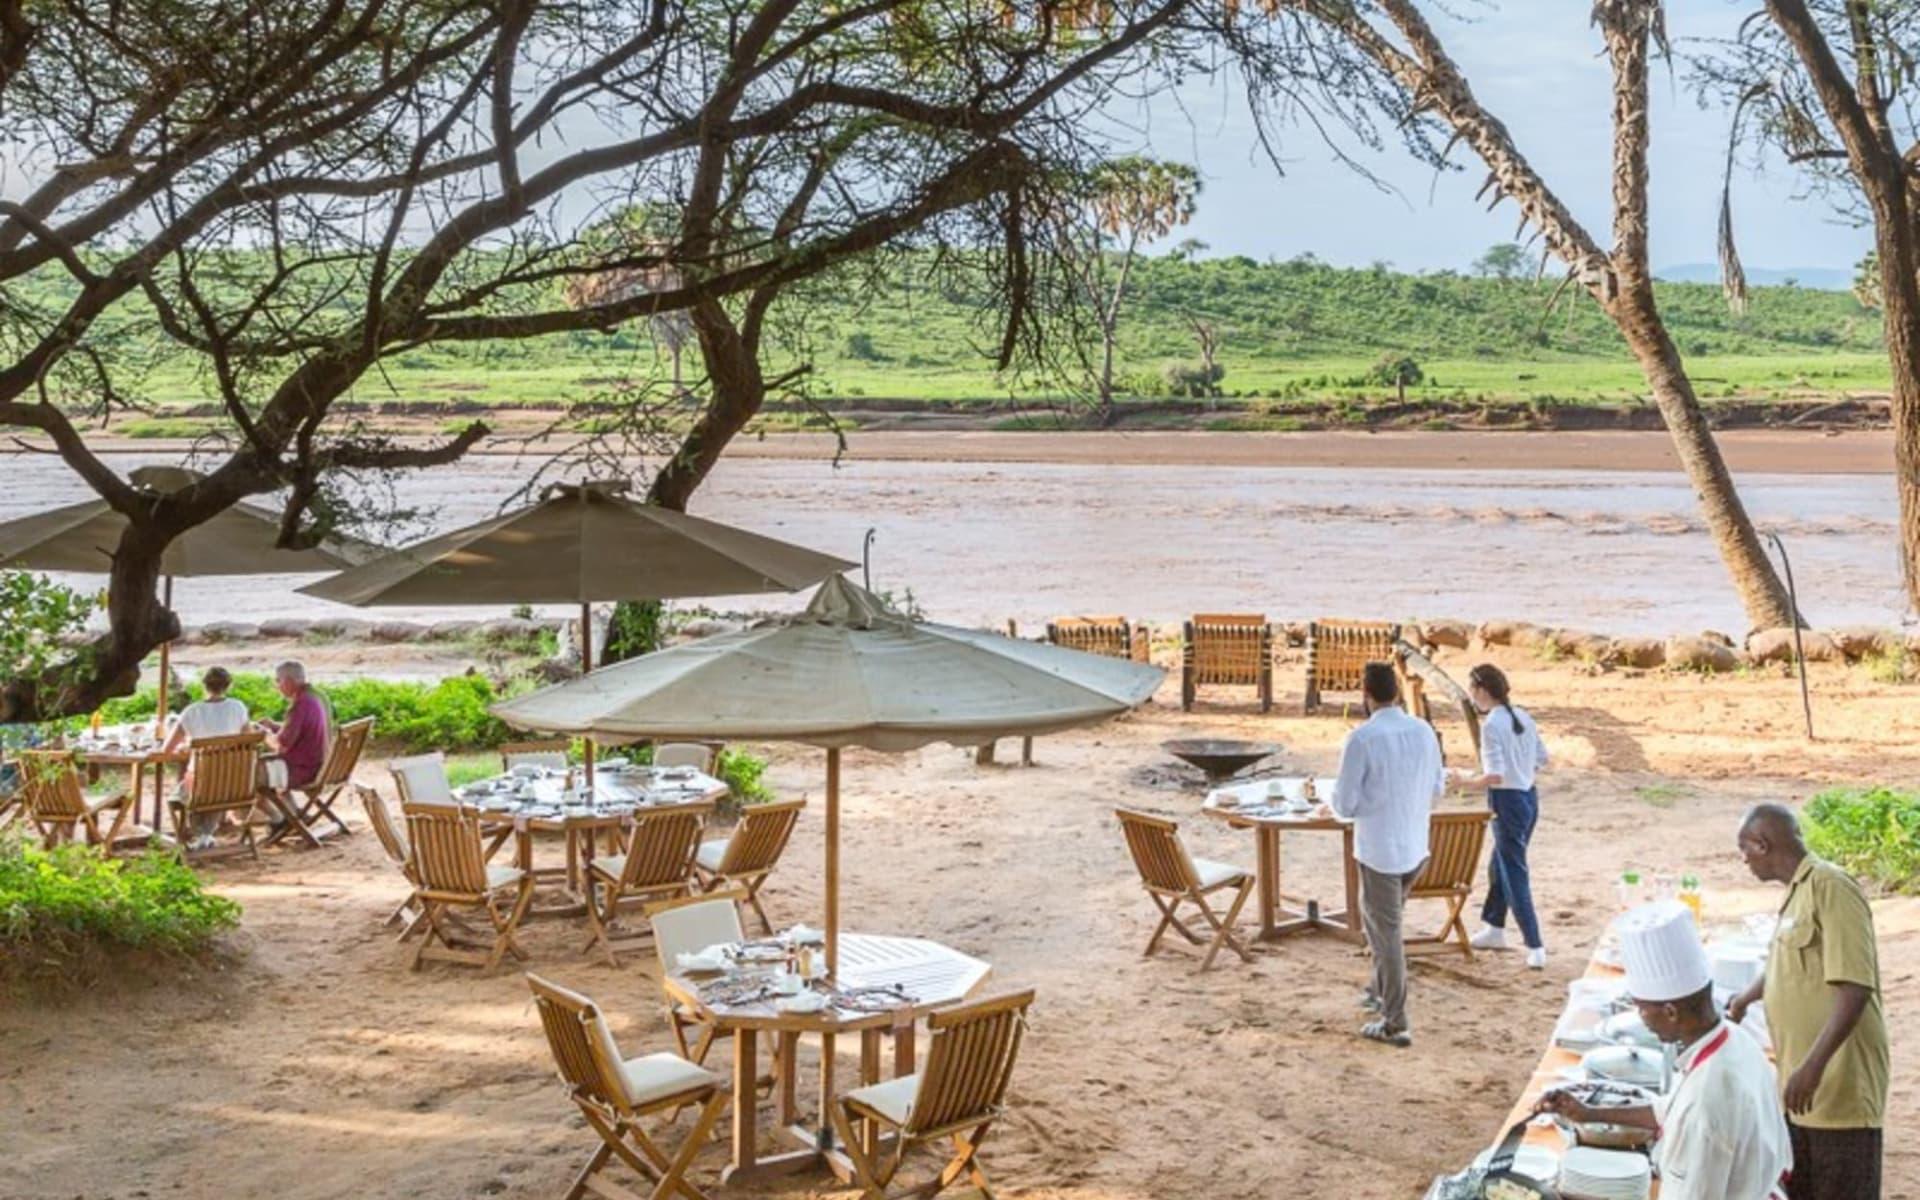 Elephant Bedroom Camp in Samburu: